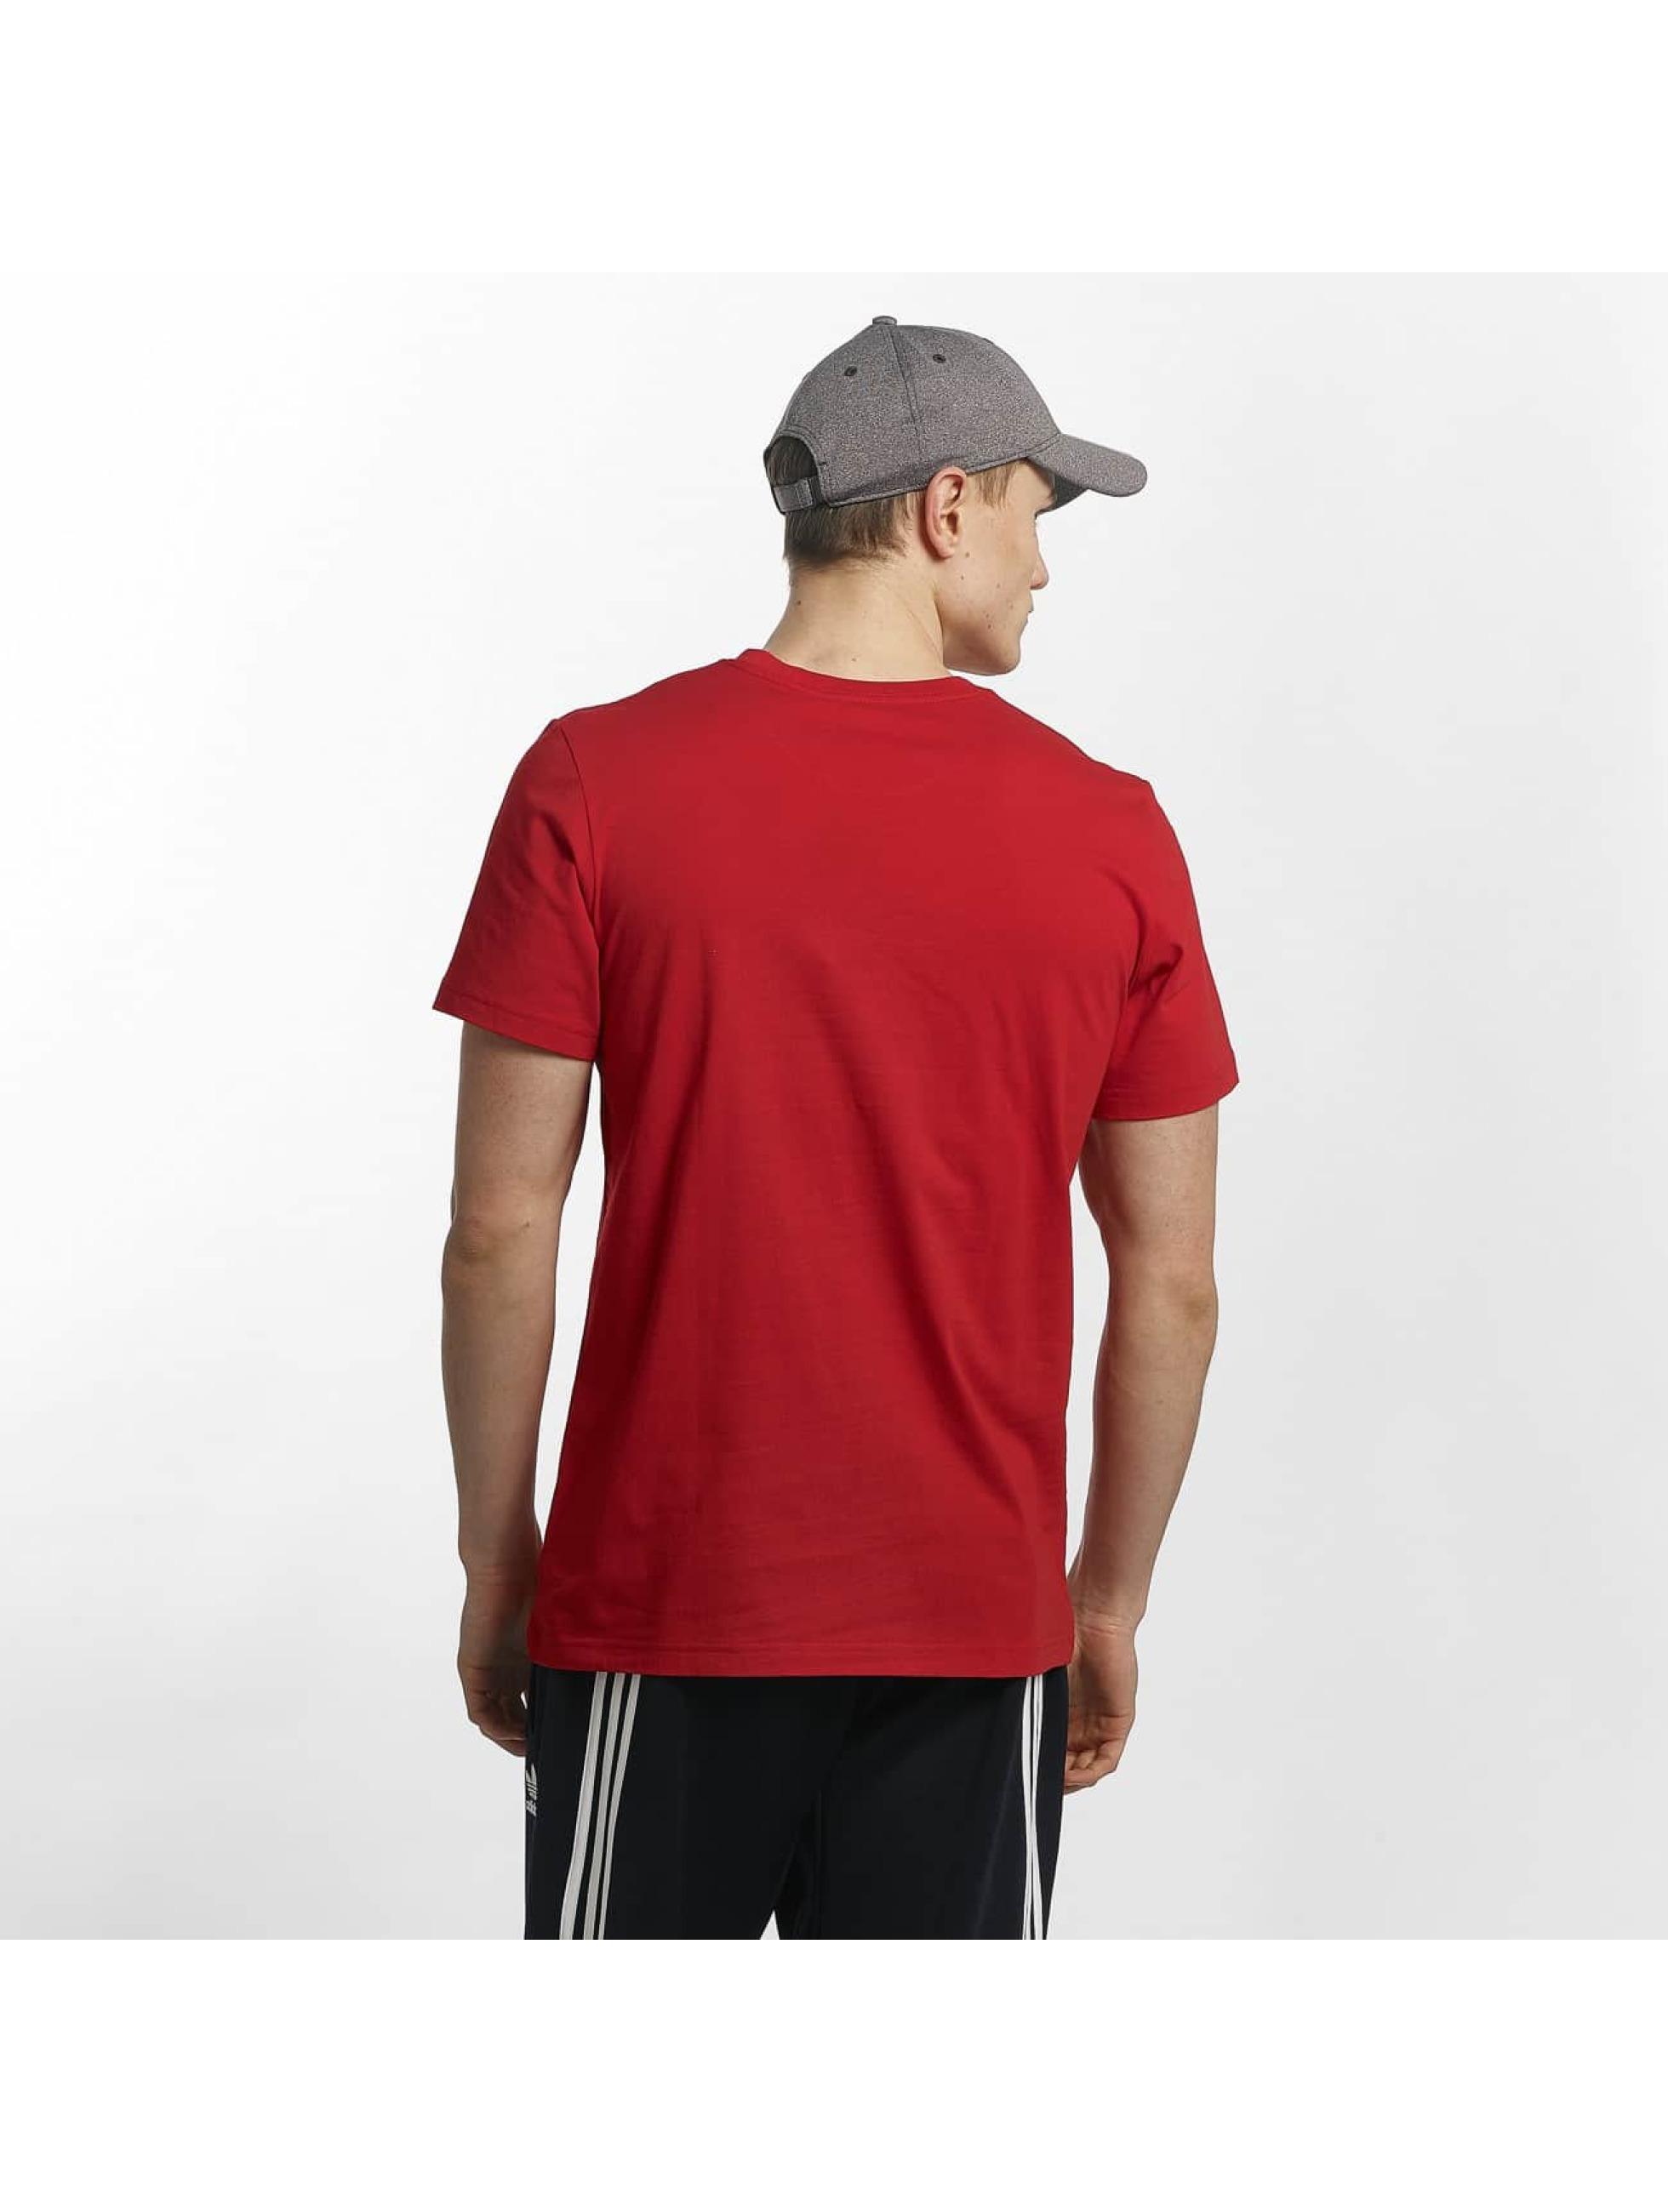 adidas T-Shirt Traction Tongue red